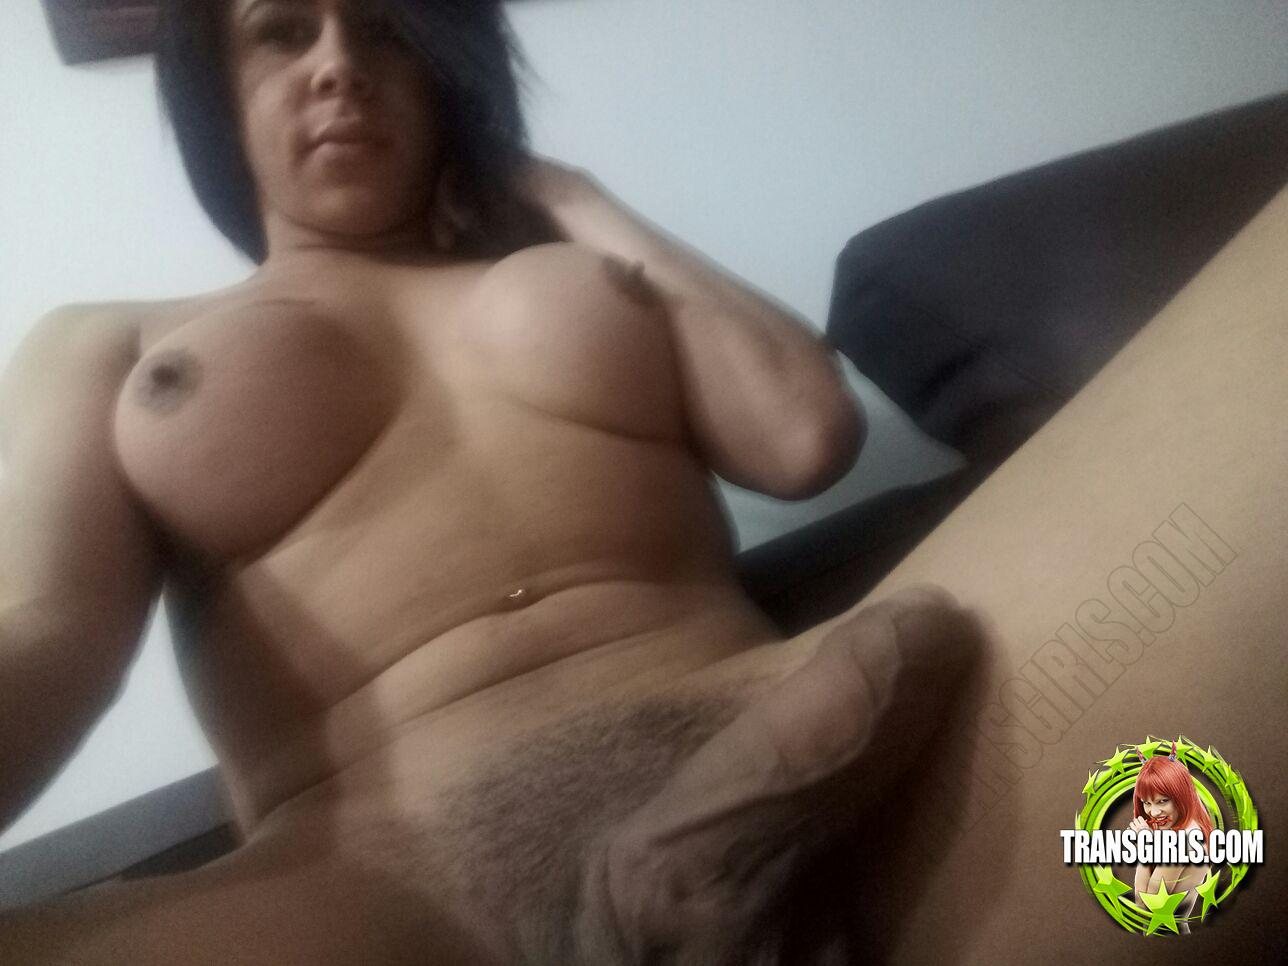 Foto Nr. 2858 von Shemale Trans Ariana Ketely